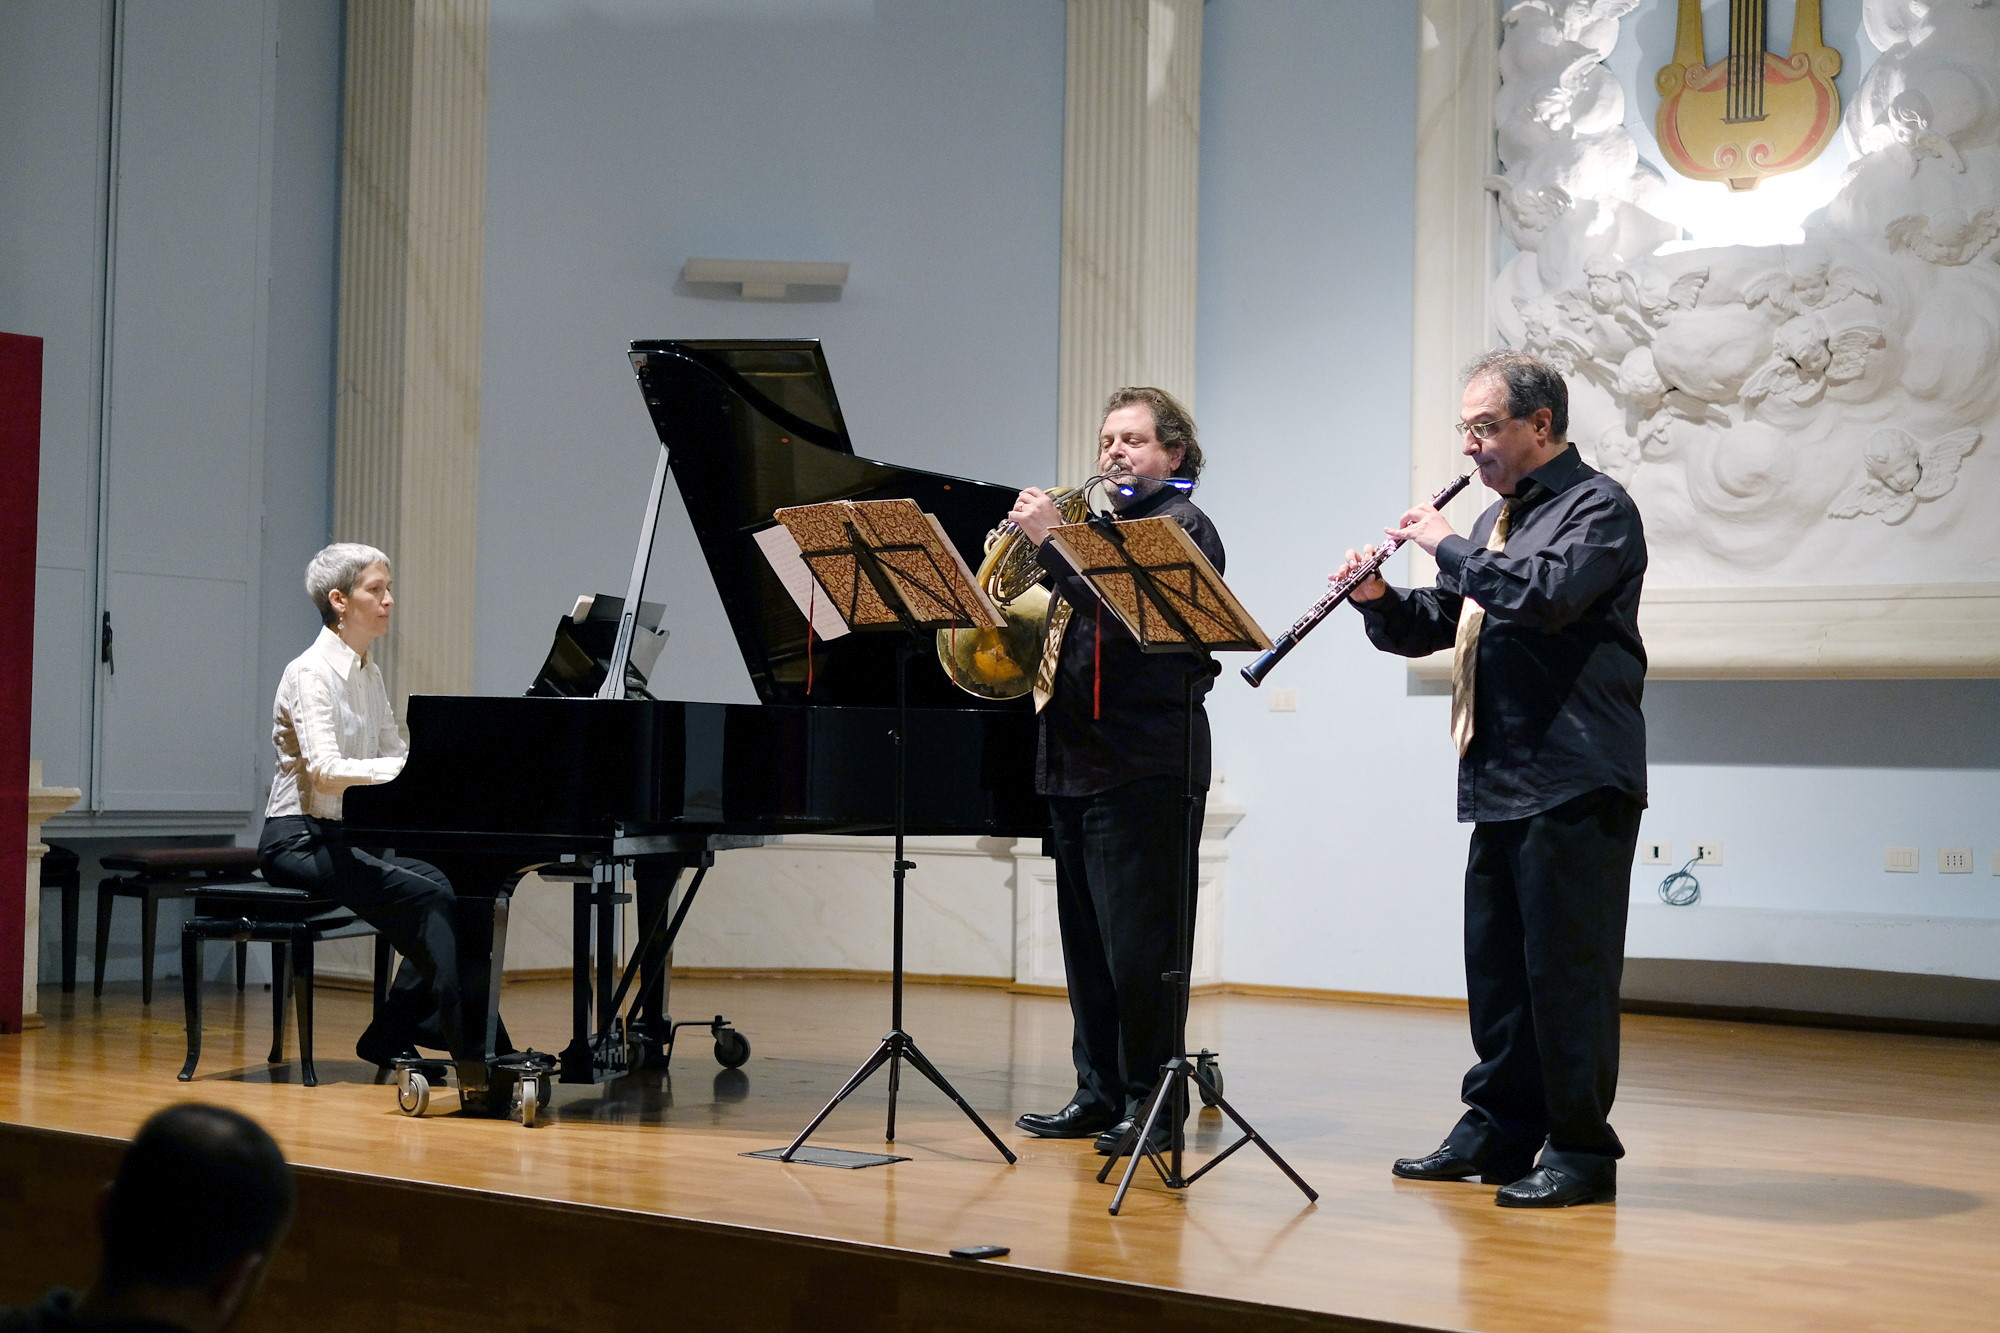 Concerto Pracchia in Musica Festival